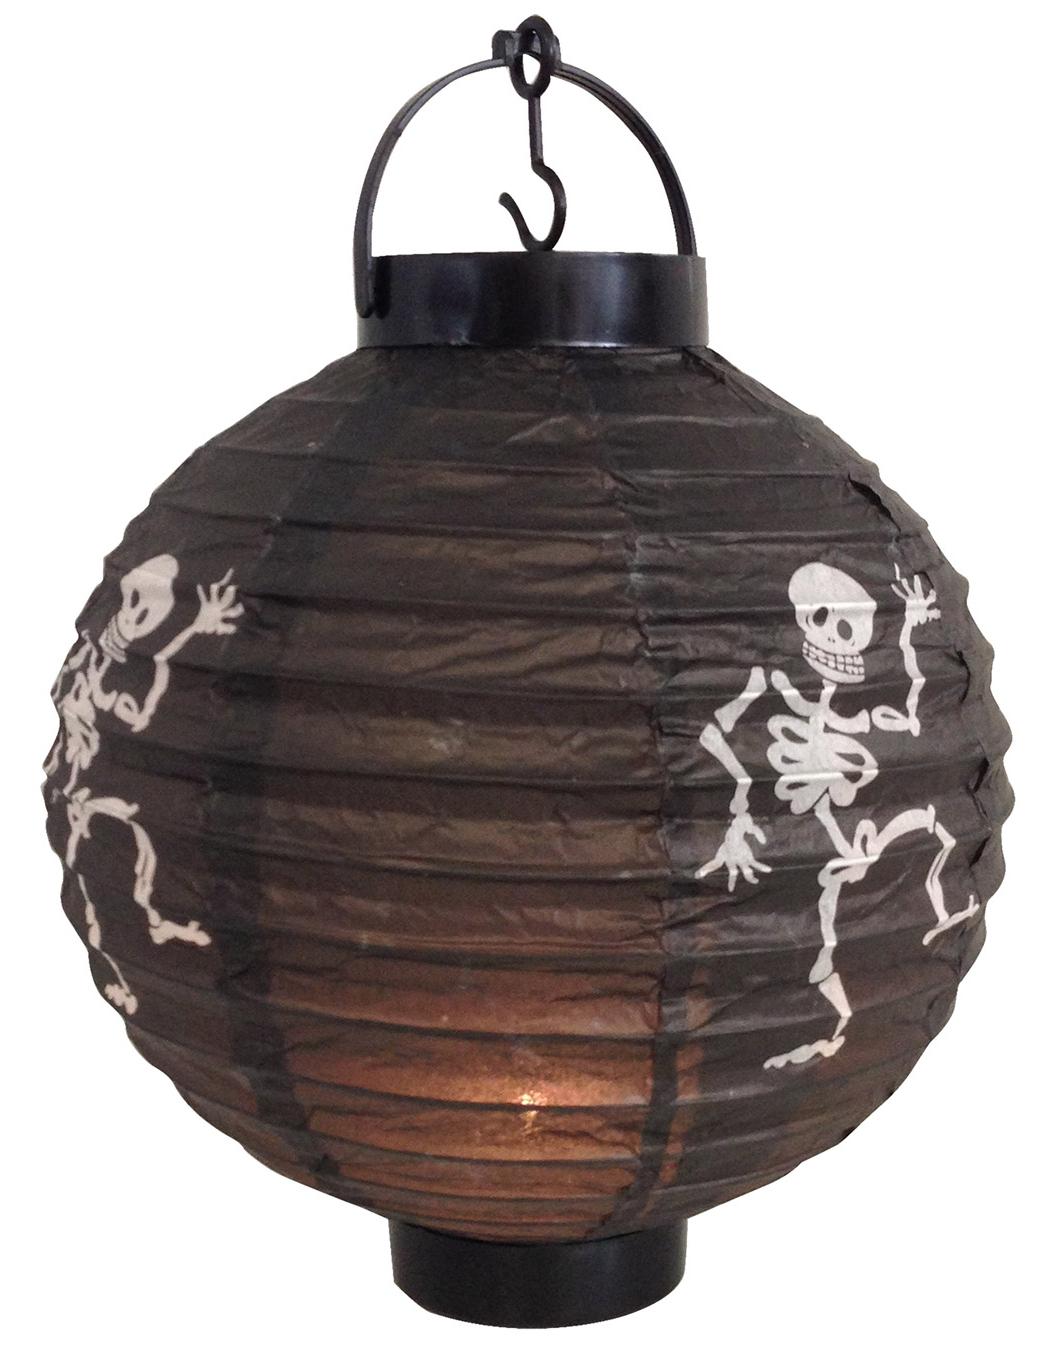 laterne mit skelett muster deko und g nstige faschingskost me vegaoo. Black Bedroom Furniture Sets. Home Design Ideas